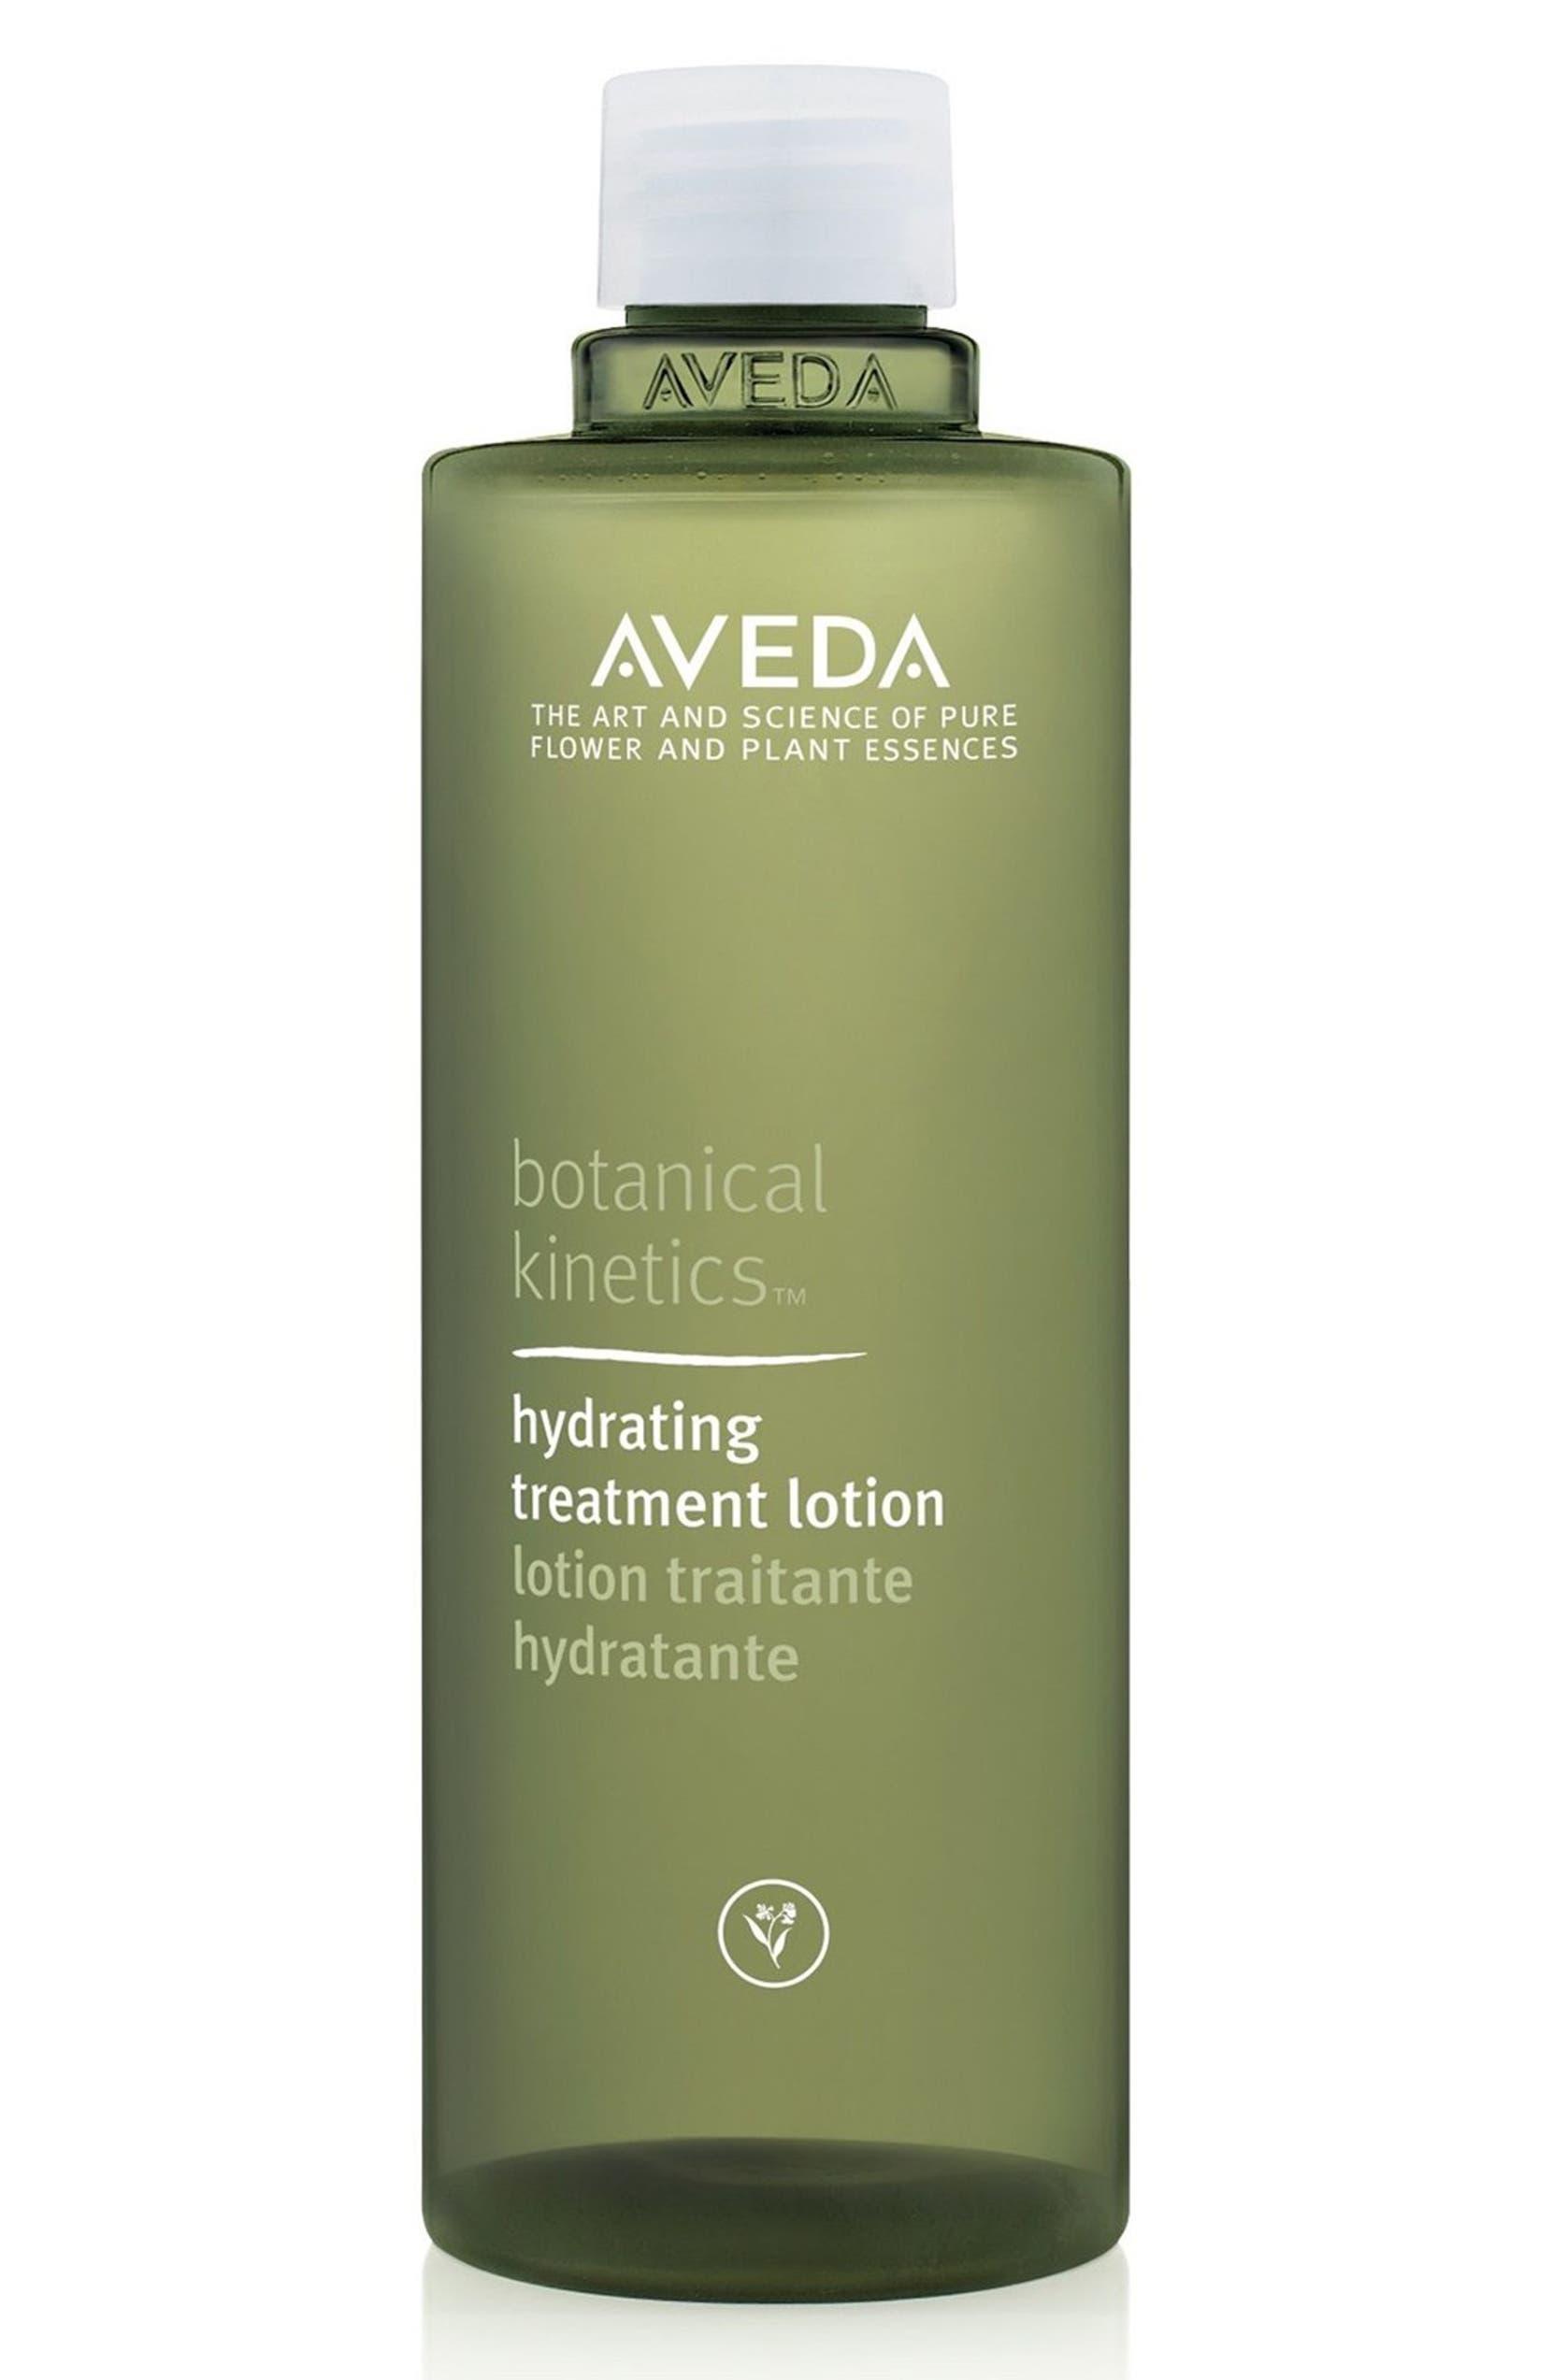 Aveda Botanical Kinetics Hydrating Treatment Lotion Nordstrom